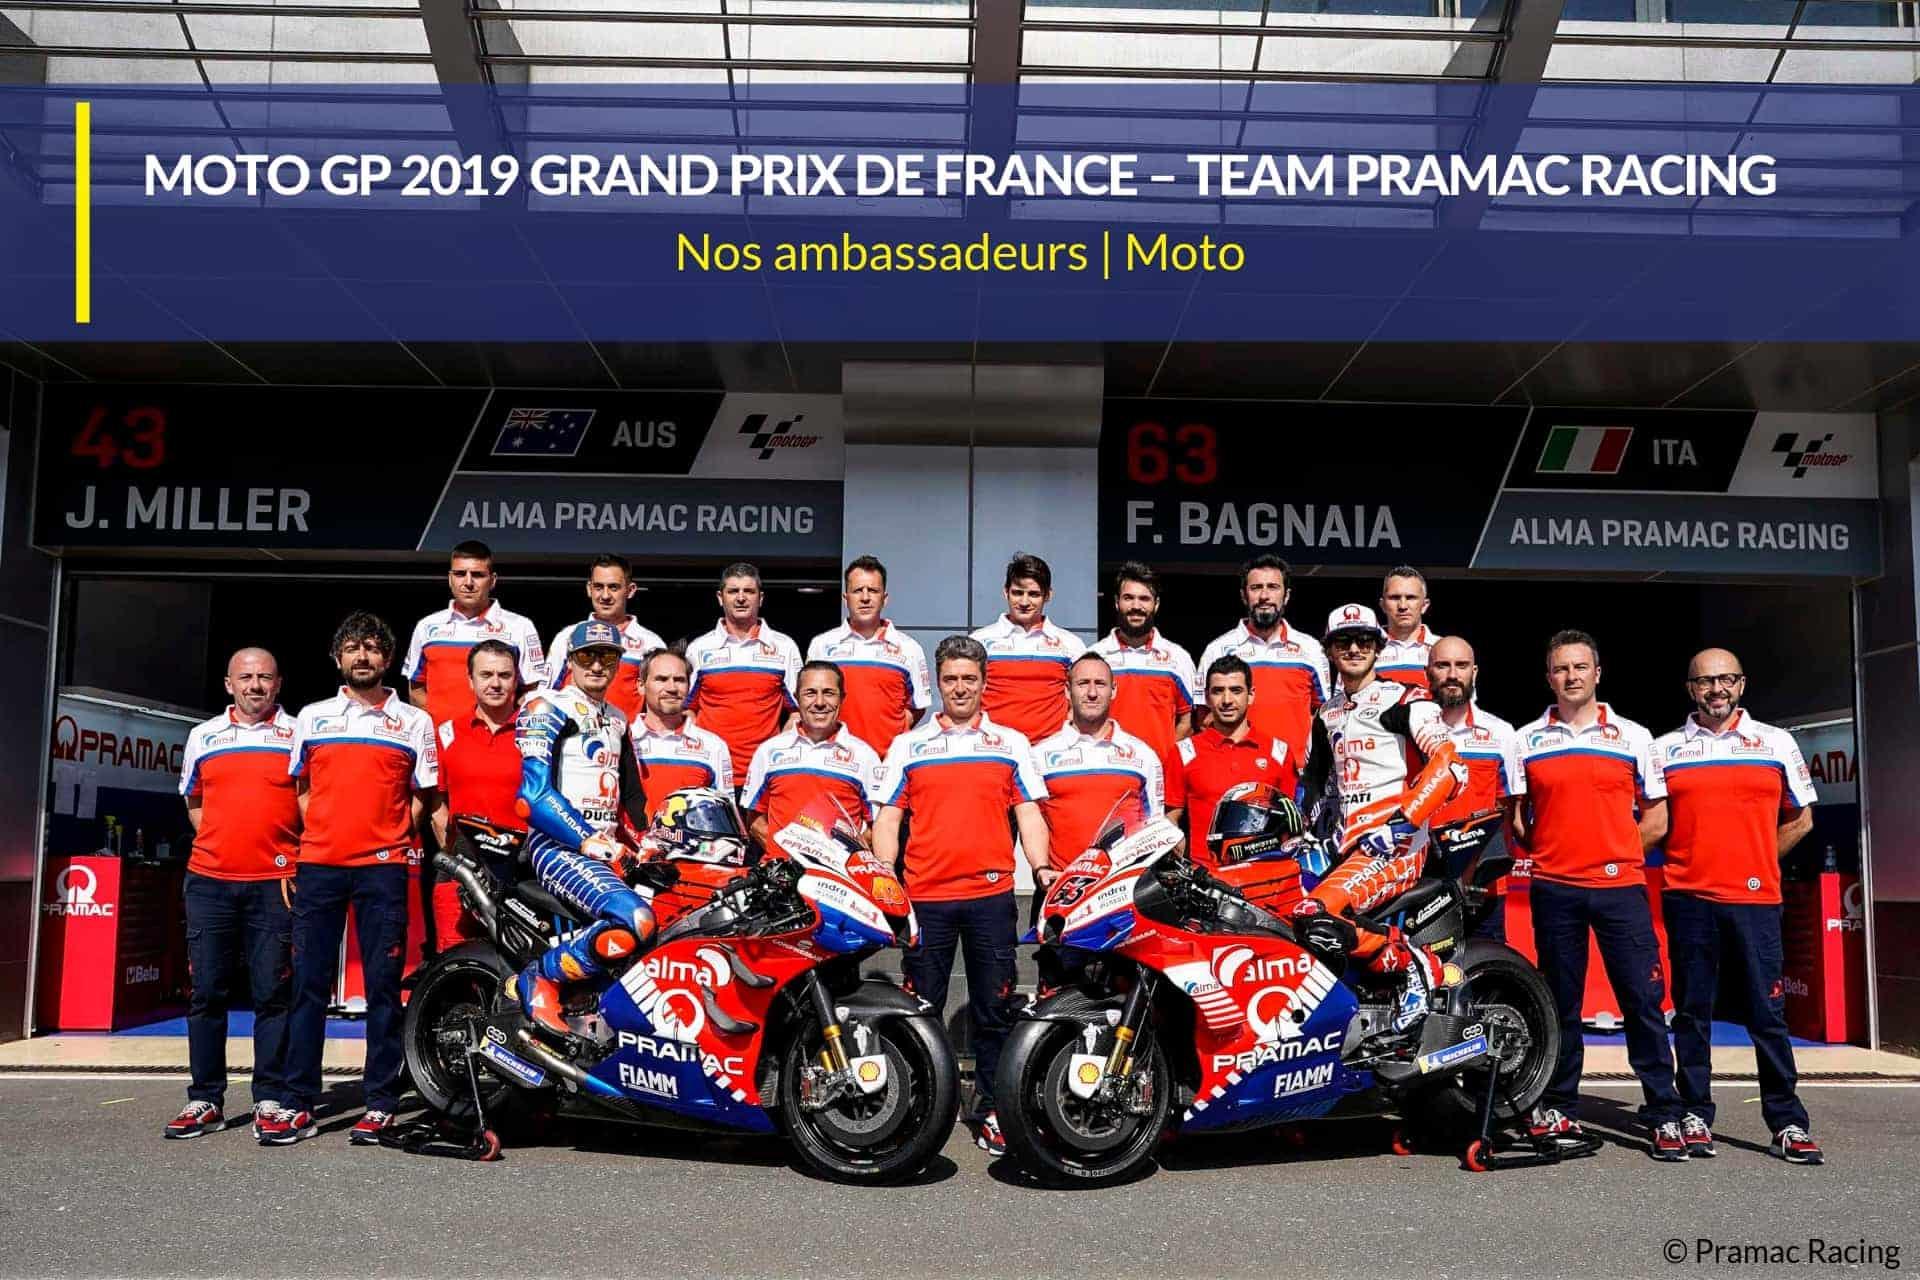 moto gp 19 team pramac racing